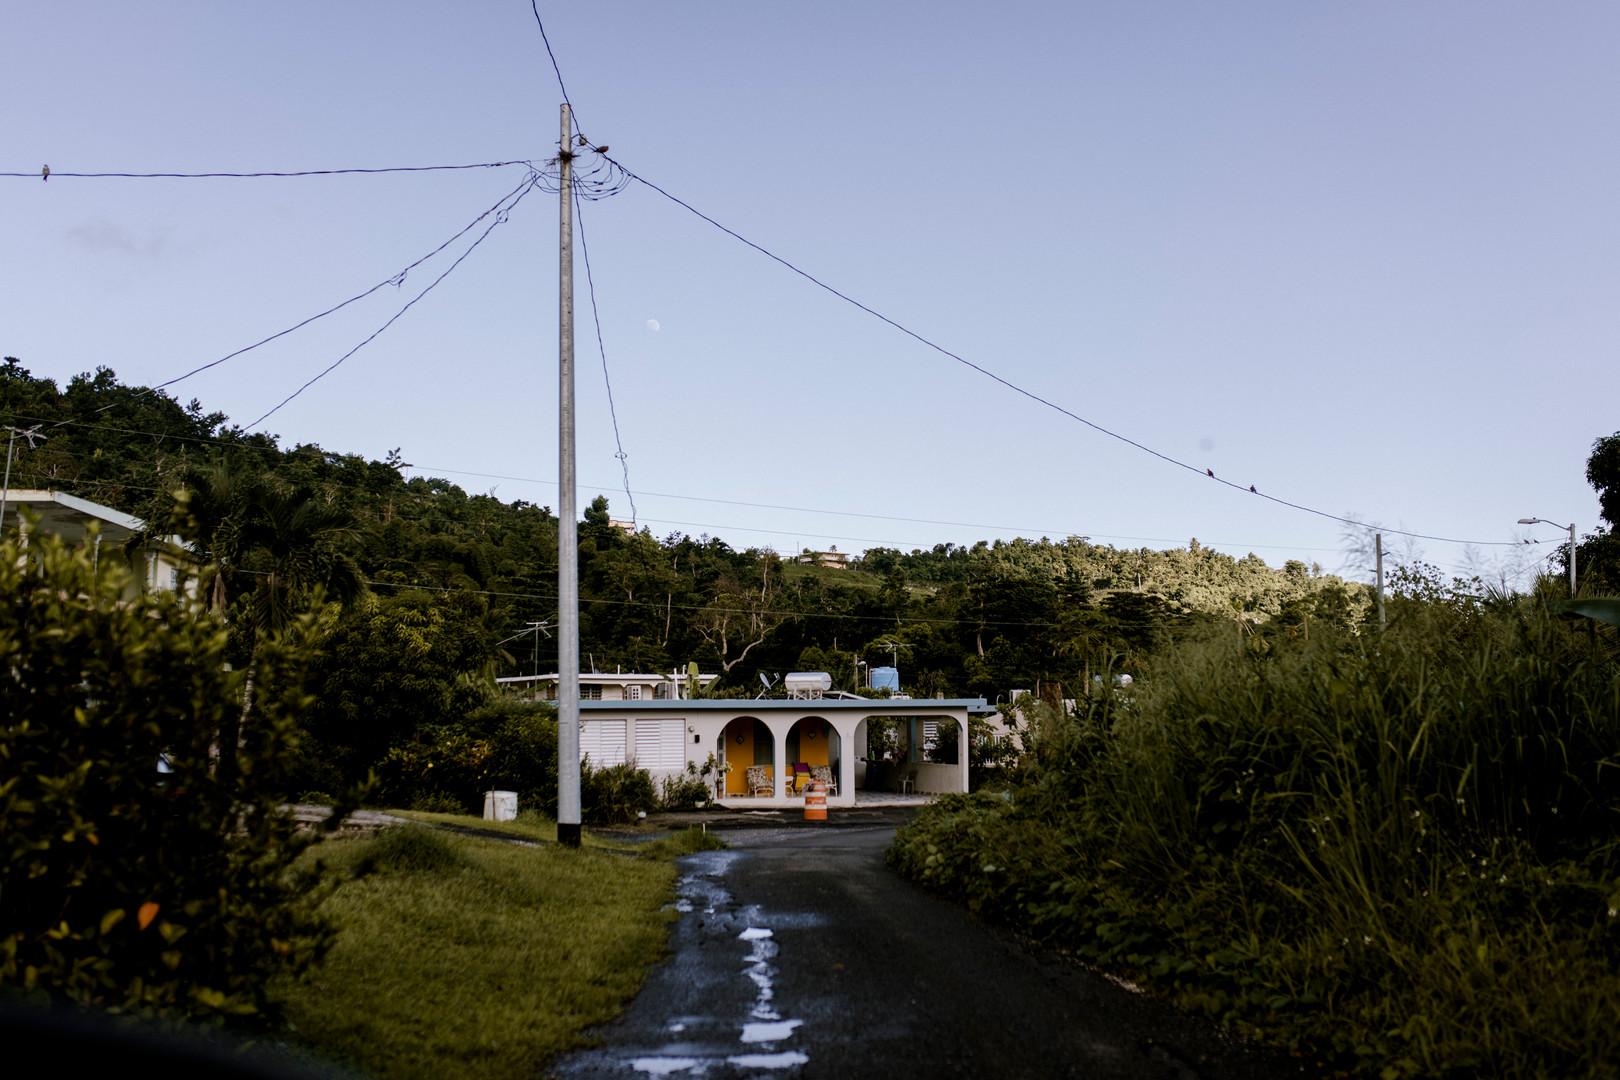 pr-285.jpg